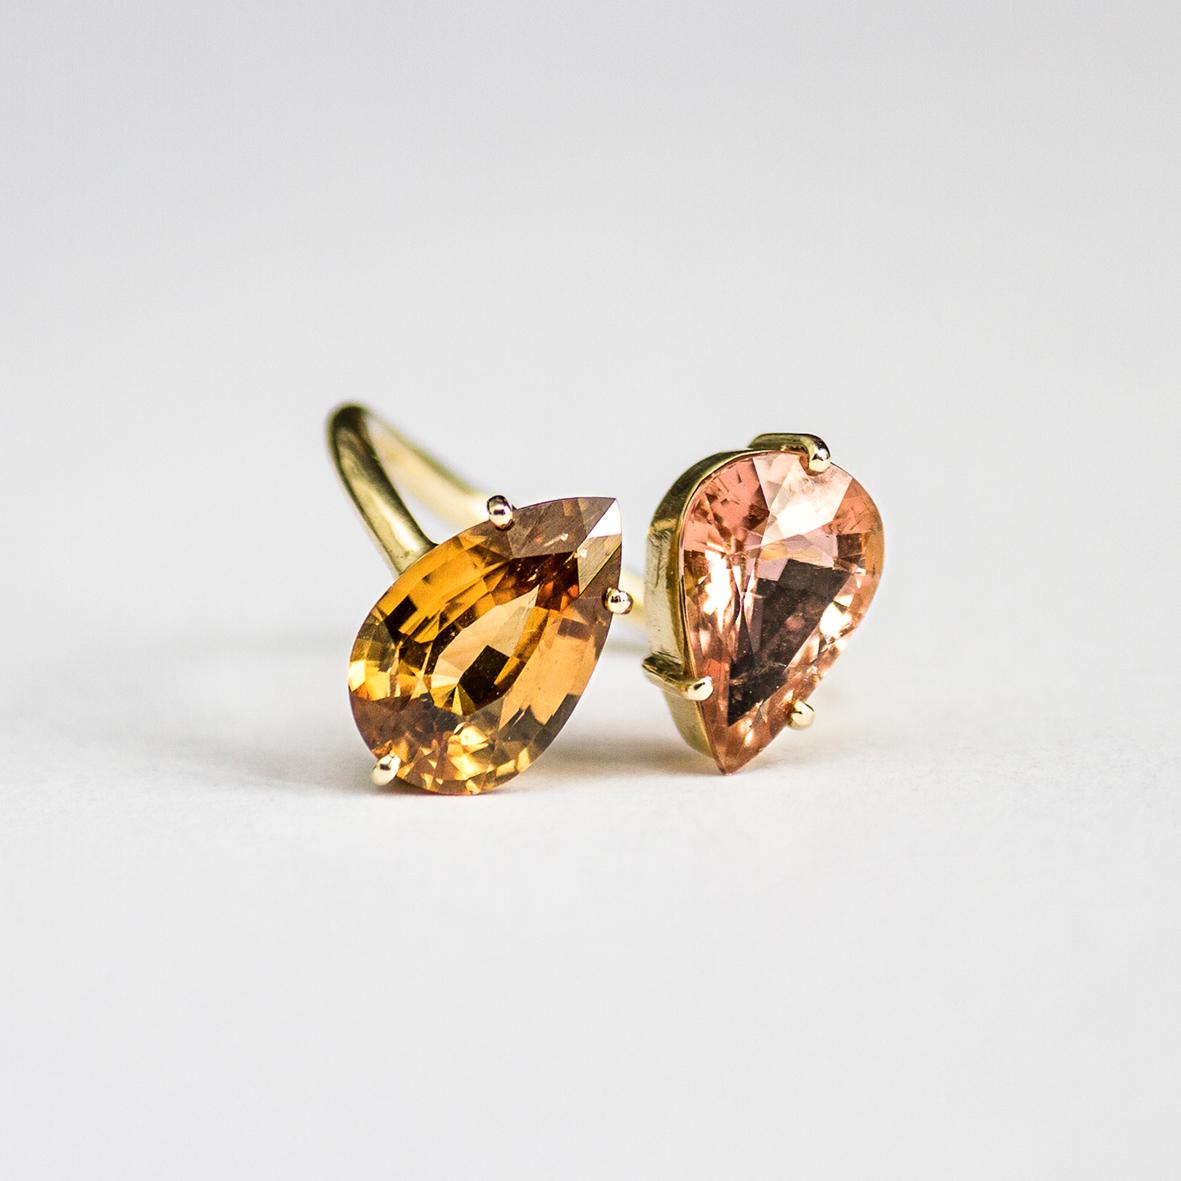 4. OONA_gems of ceylon_principal_tourmaline and zircon ring